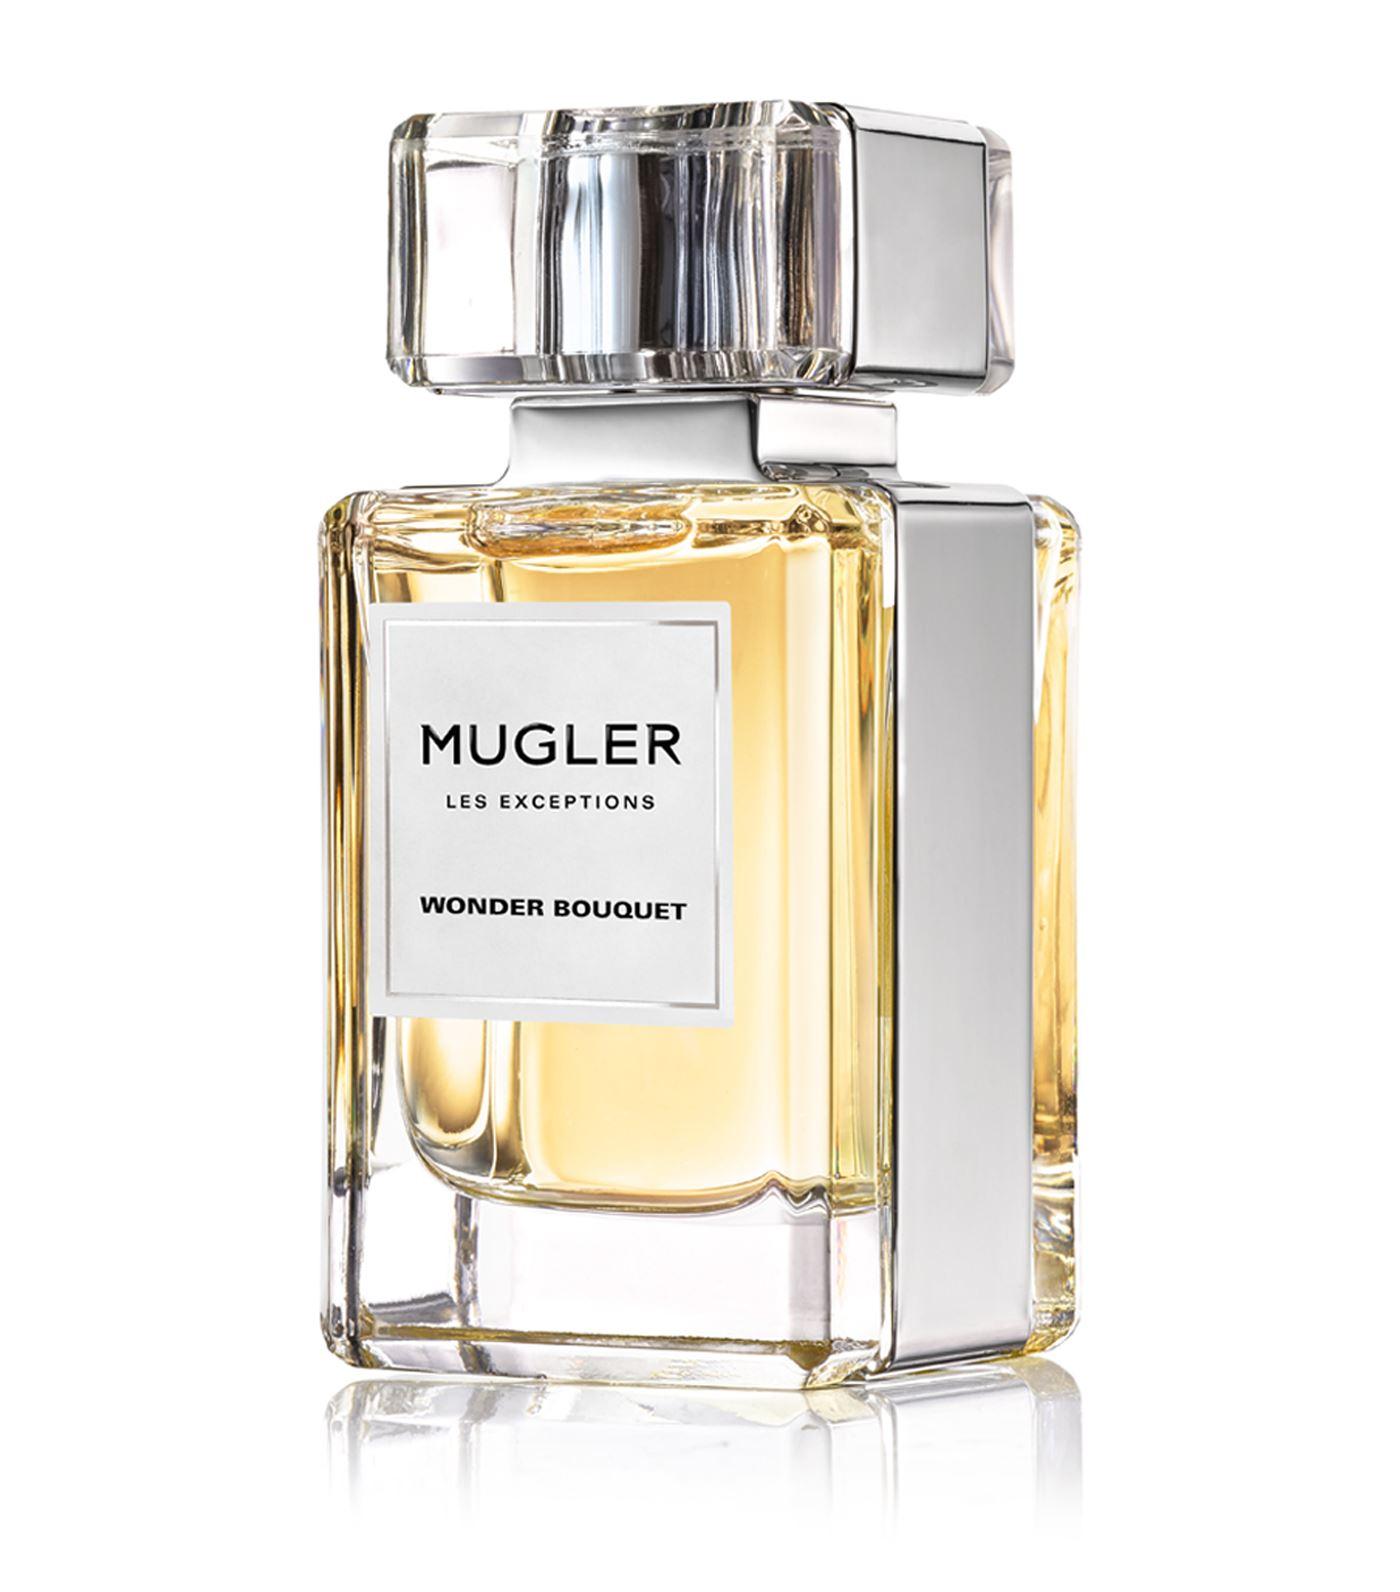 Thierry Mugler Les Exceptions Wonder Bouquet Flacon